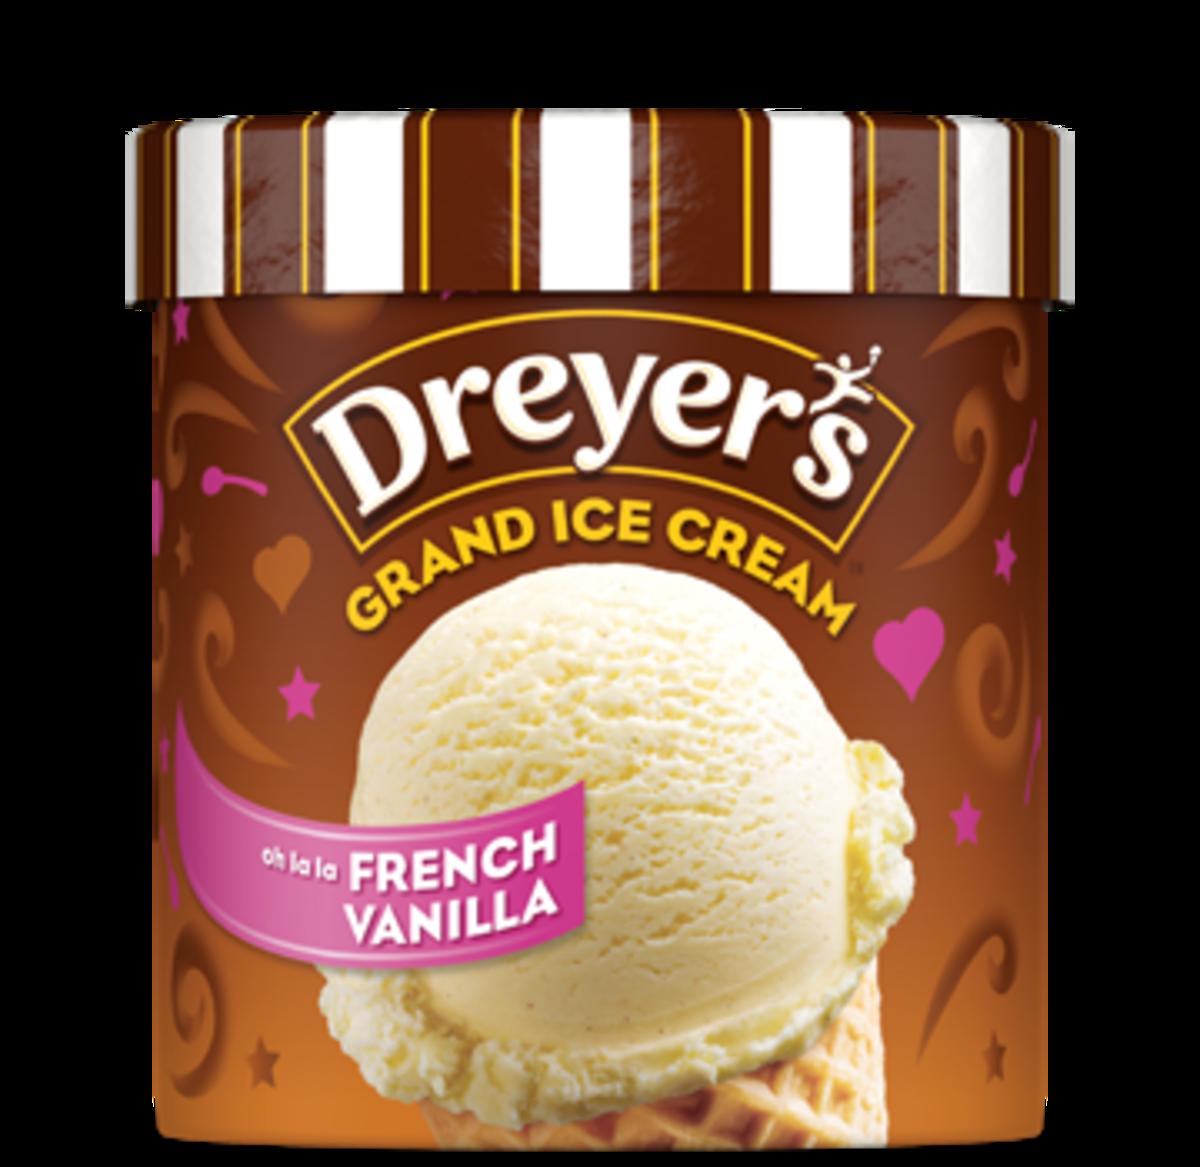 Dreyer's French Vanilla